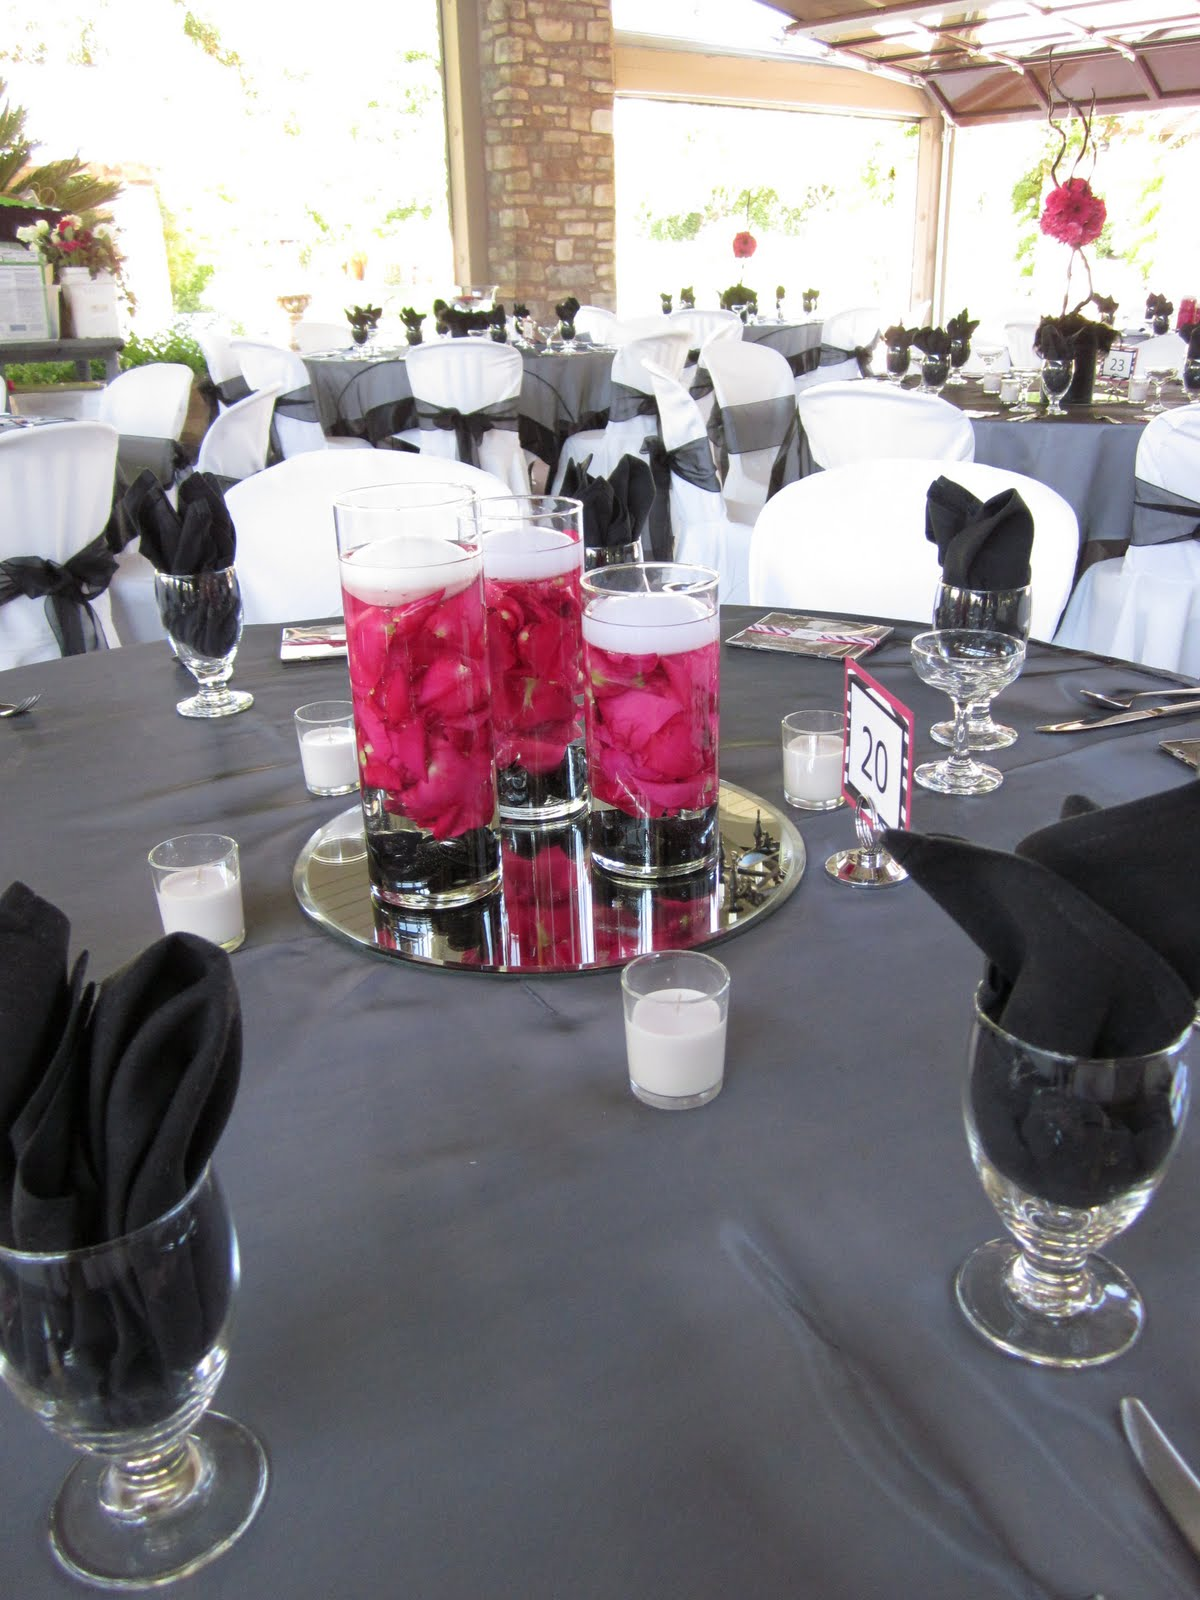 Pin Concert Ticket Wedding Invitations Cake on Pinterest